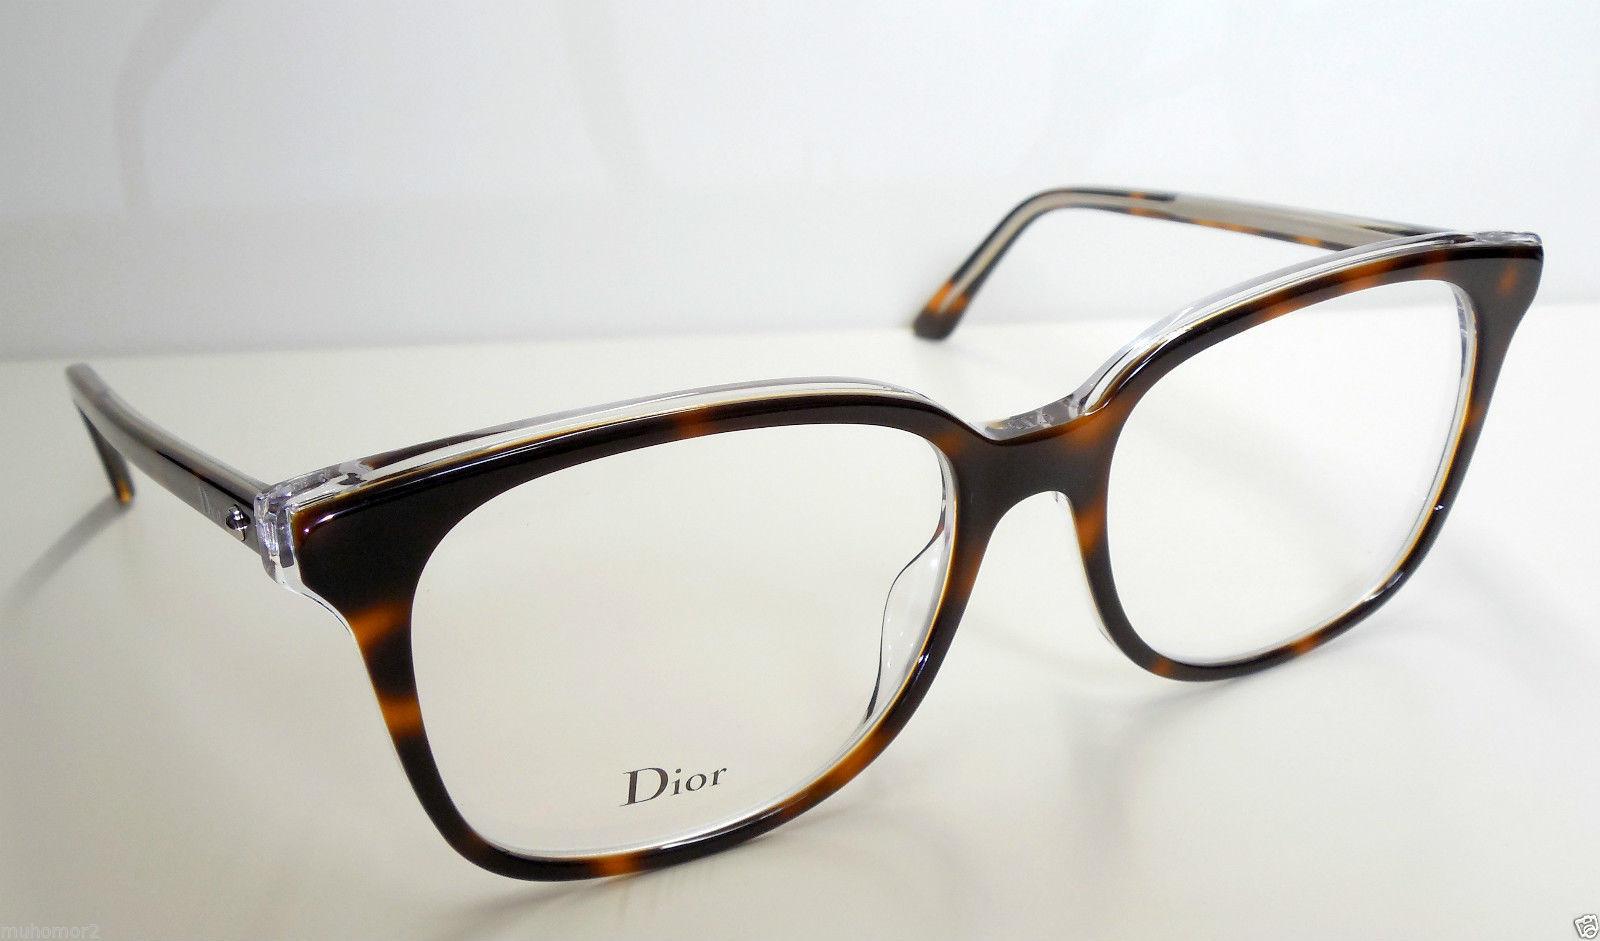 Neu Christian Dior Montaigne 26 U61 Havana and similar items